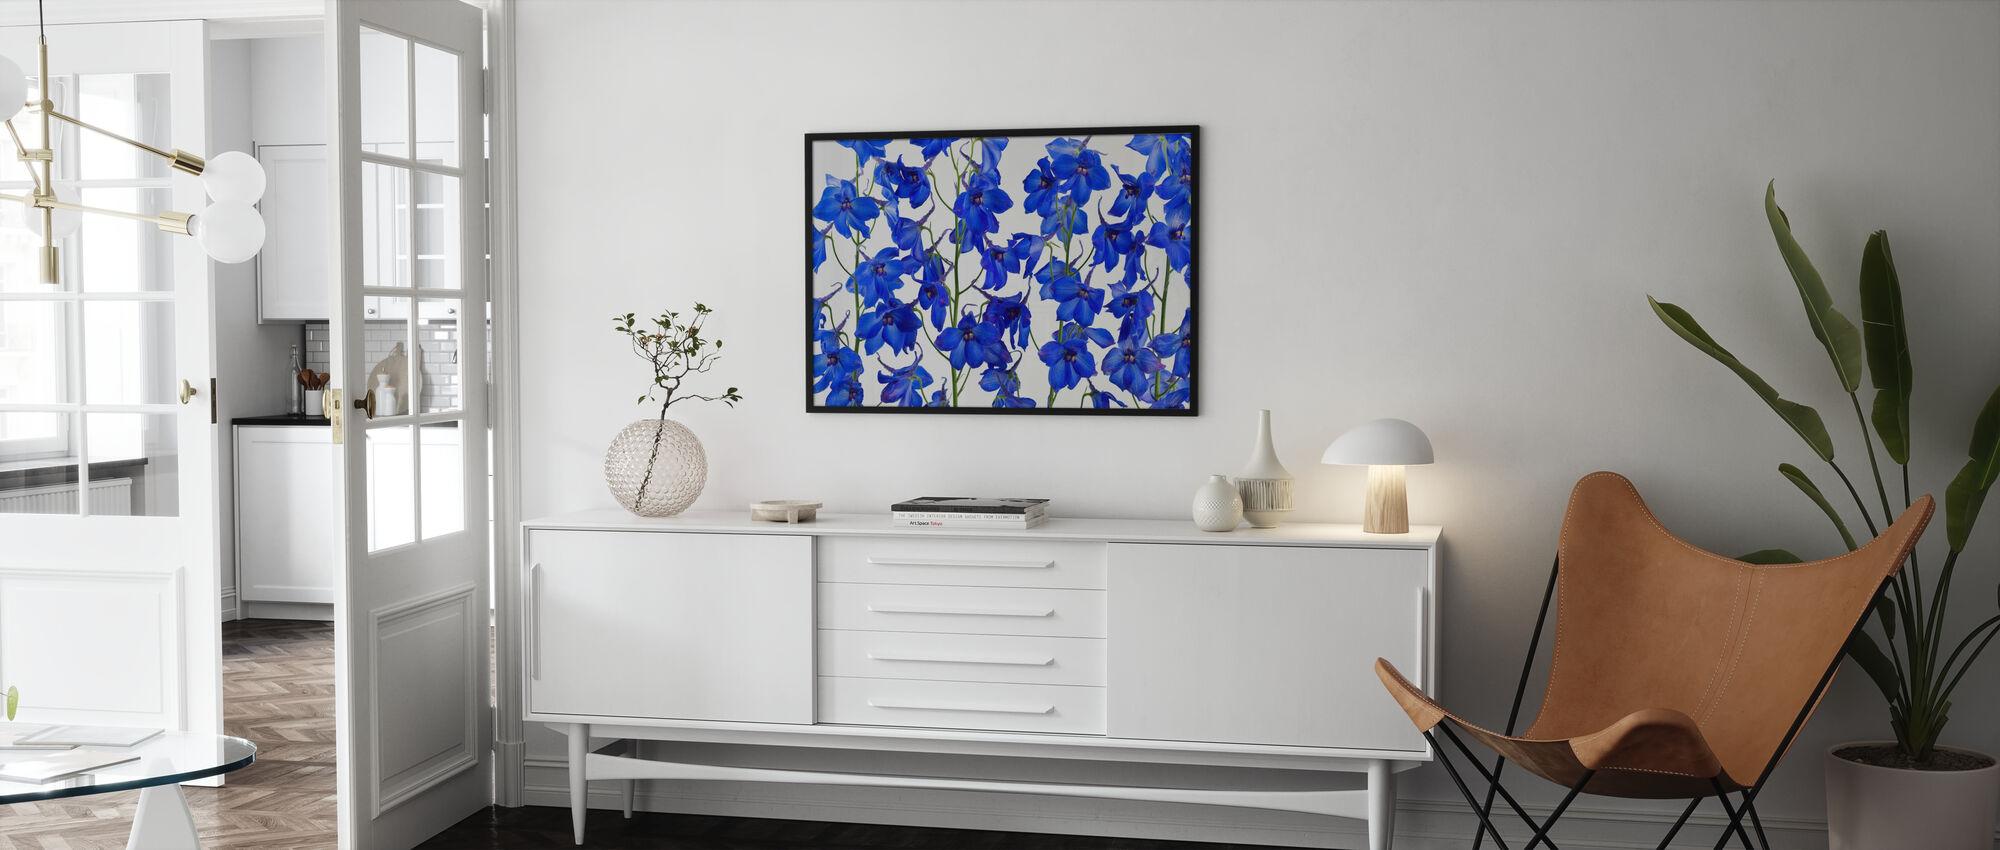 Blå Blommor - Inramad tavla - Vardagsrum